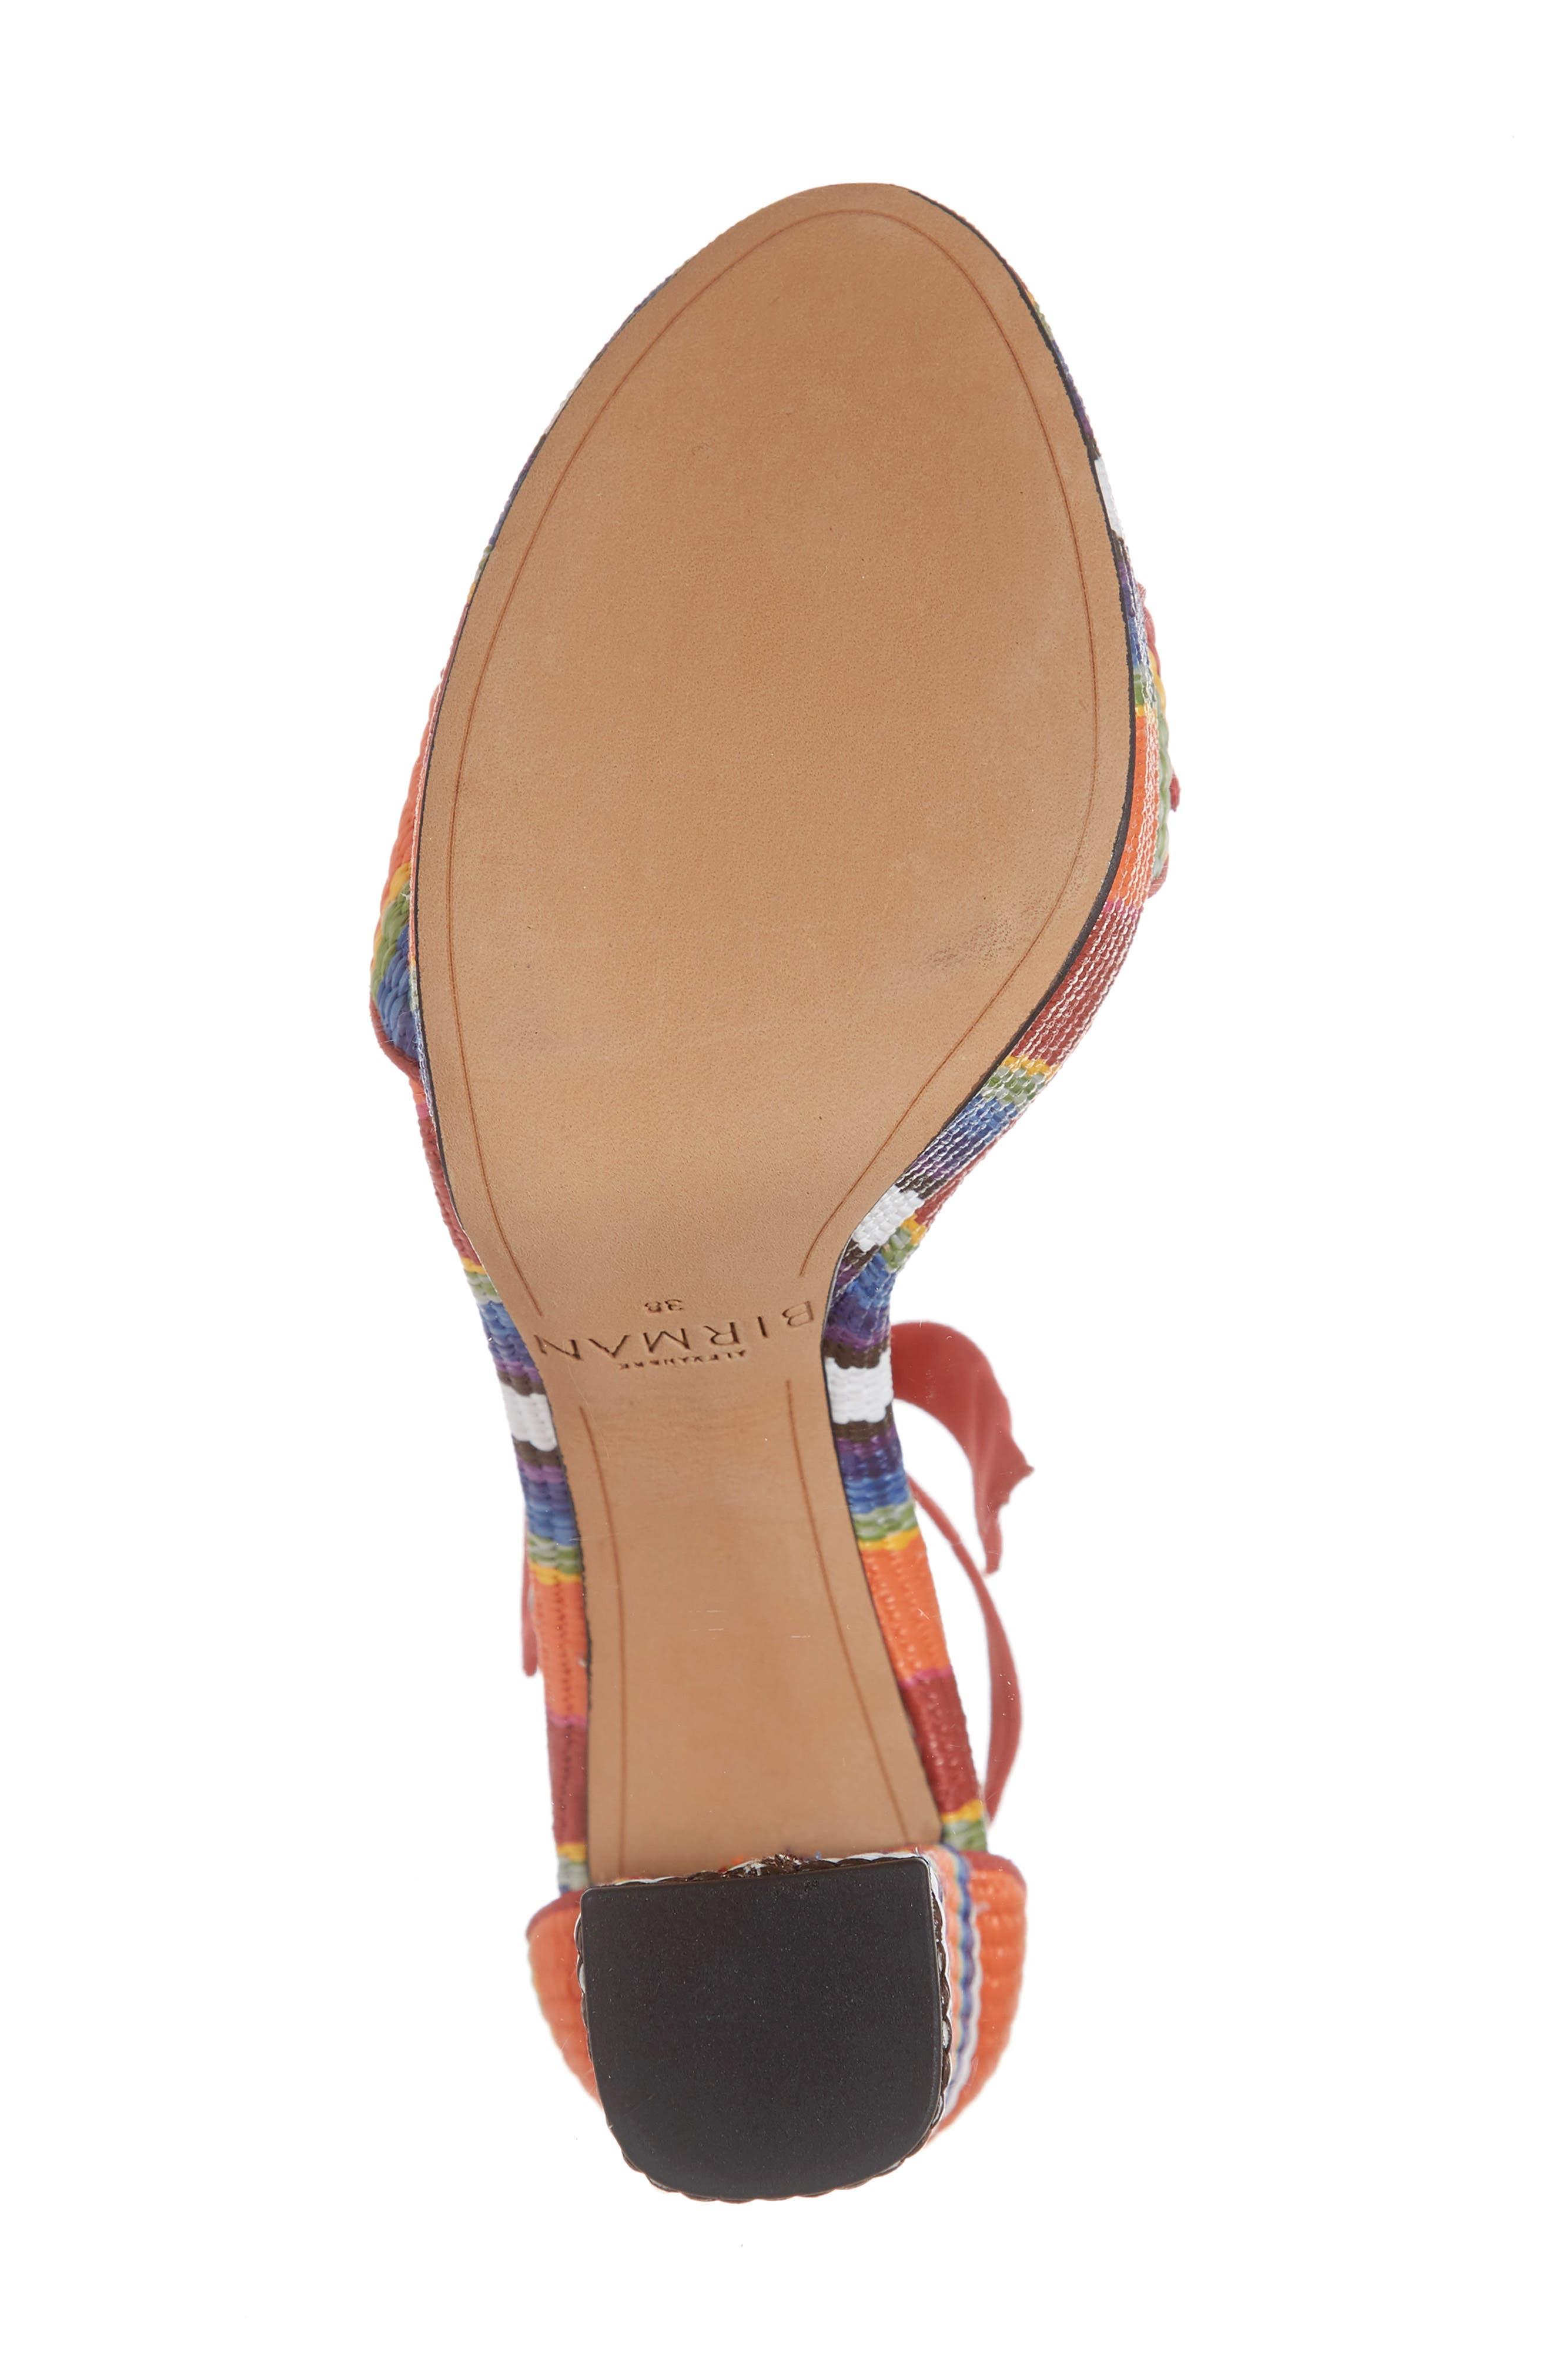 ALEXANDRE BIRMAN, Clarita Platform Sandal, Alternate thumbnail 6, color, CORAL MULTI